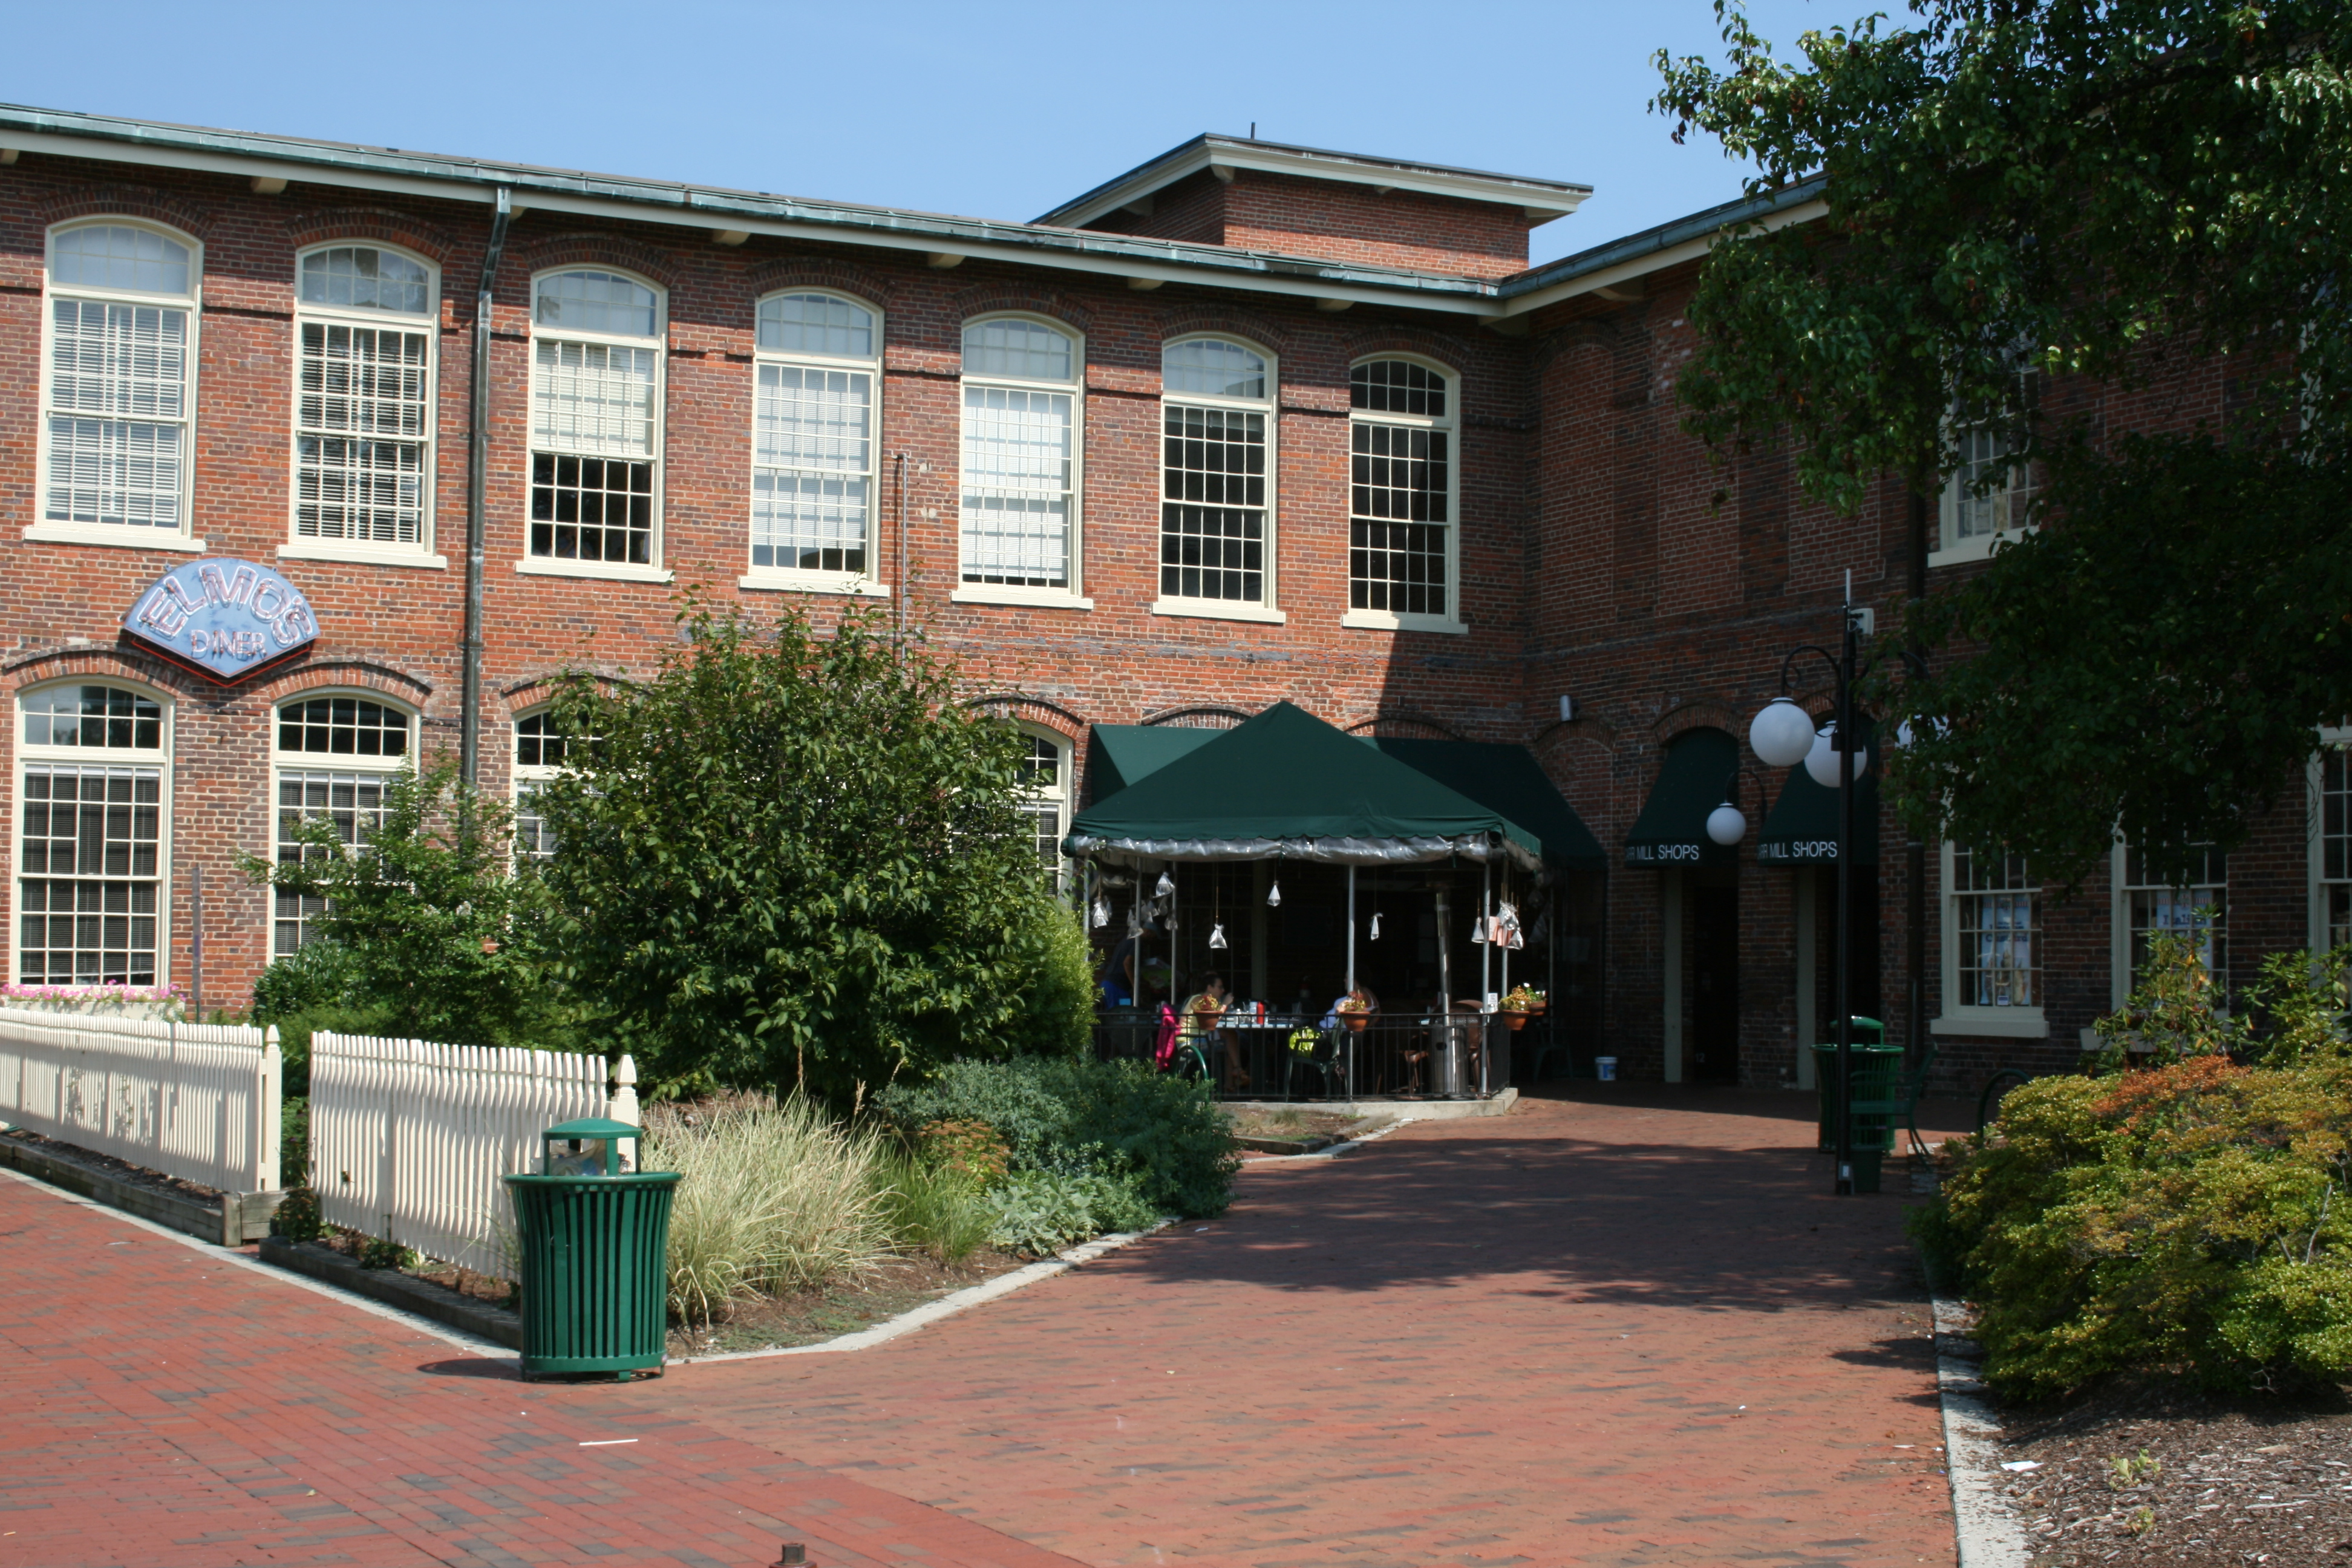 2008-07-28 Elmo's Diner in Carrboro.jpg